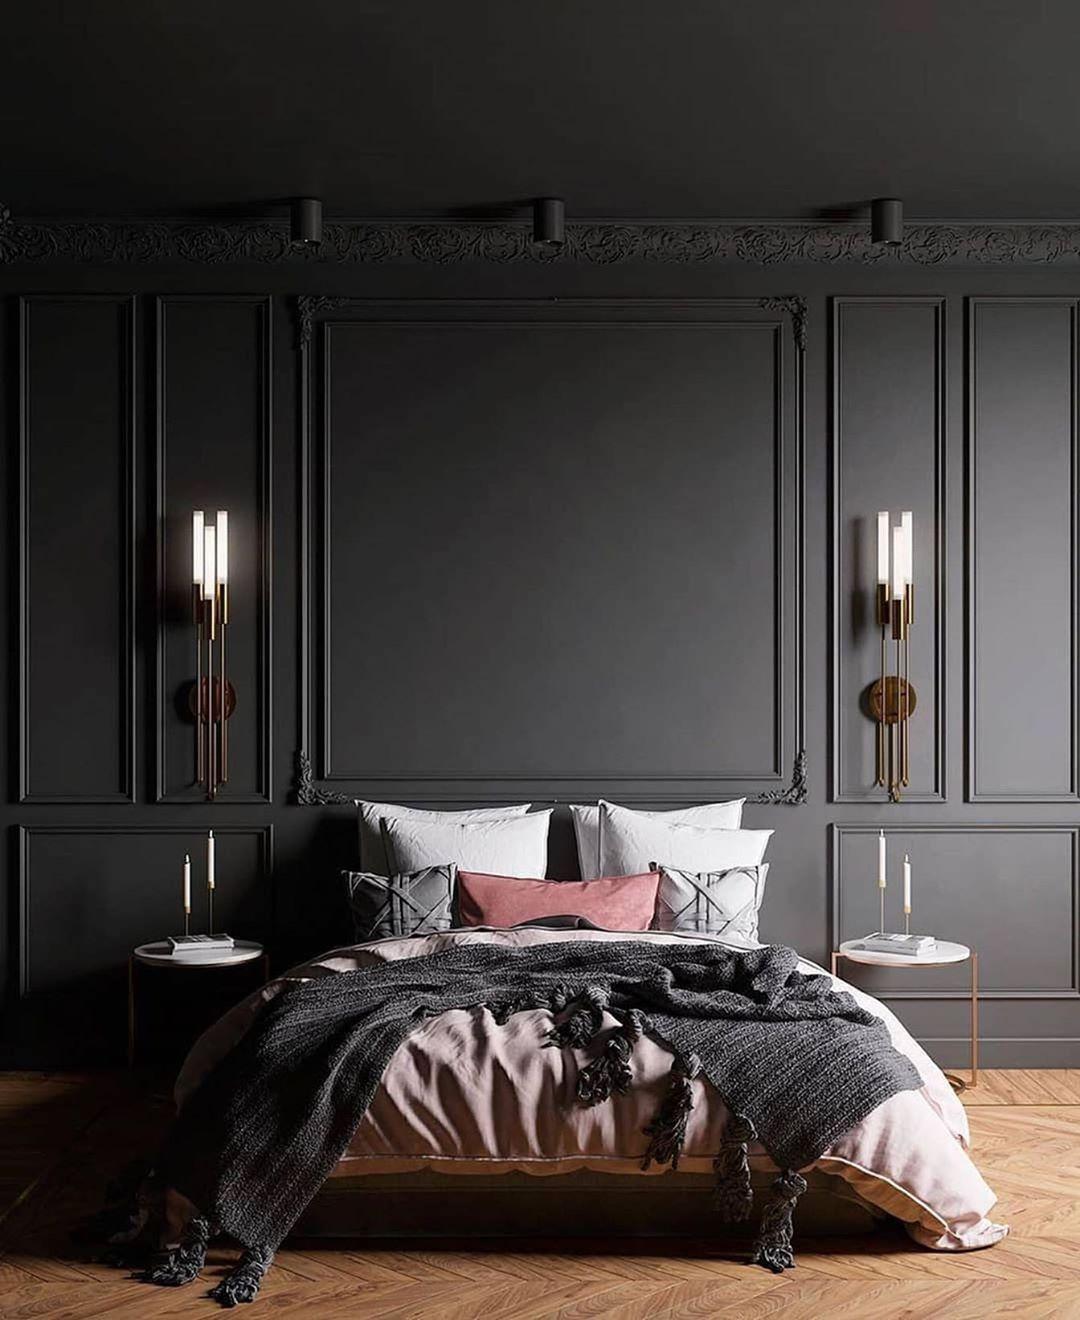 insplosion_COZYANDLOVELY-BEDROOM_by_berginterior-minimal-bedroom